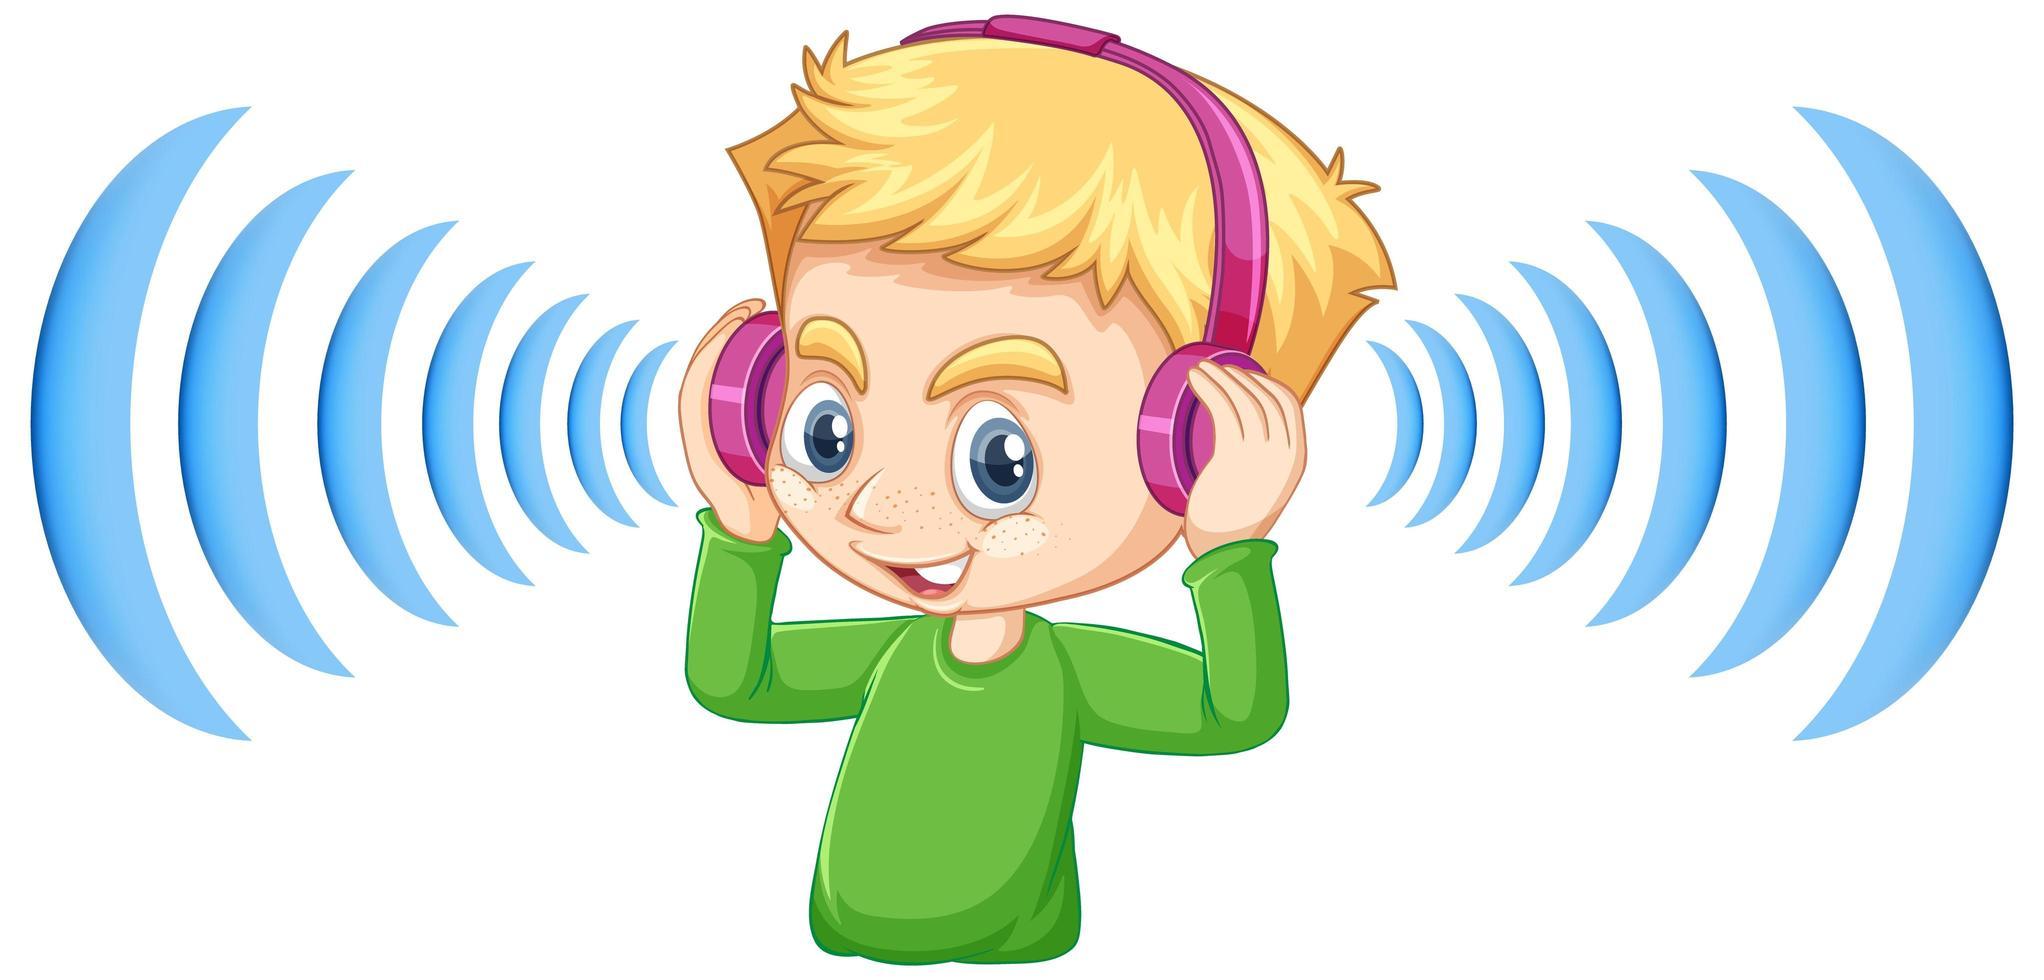 niño con auriculares con cancelación de ruido vector